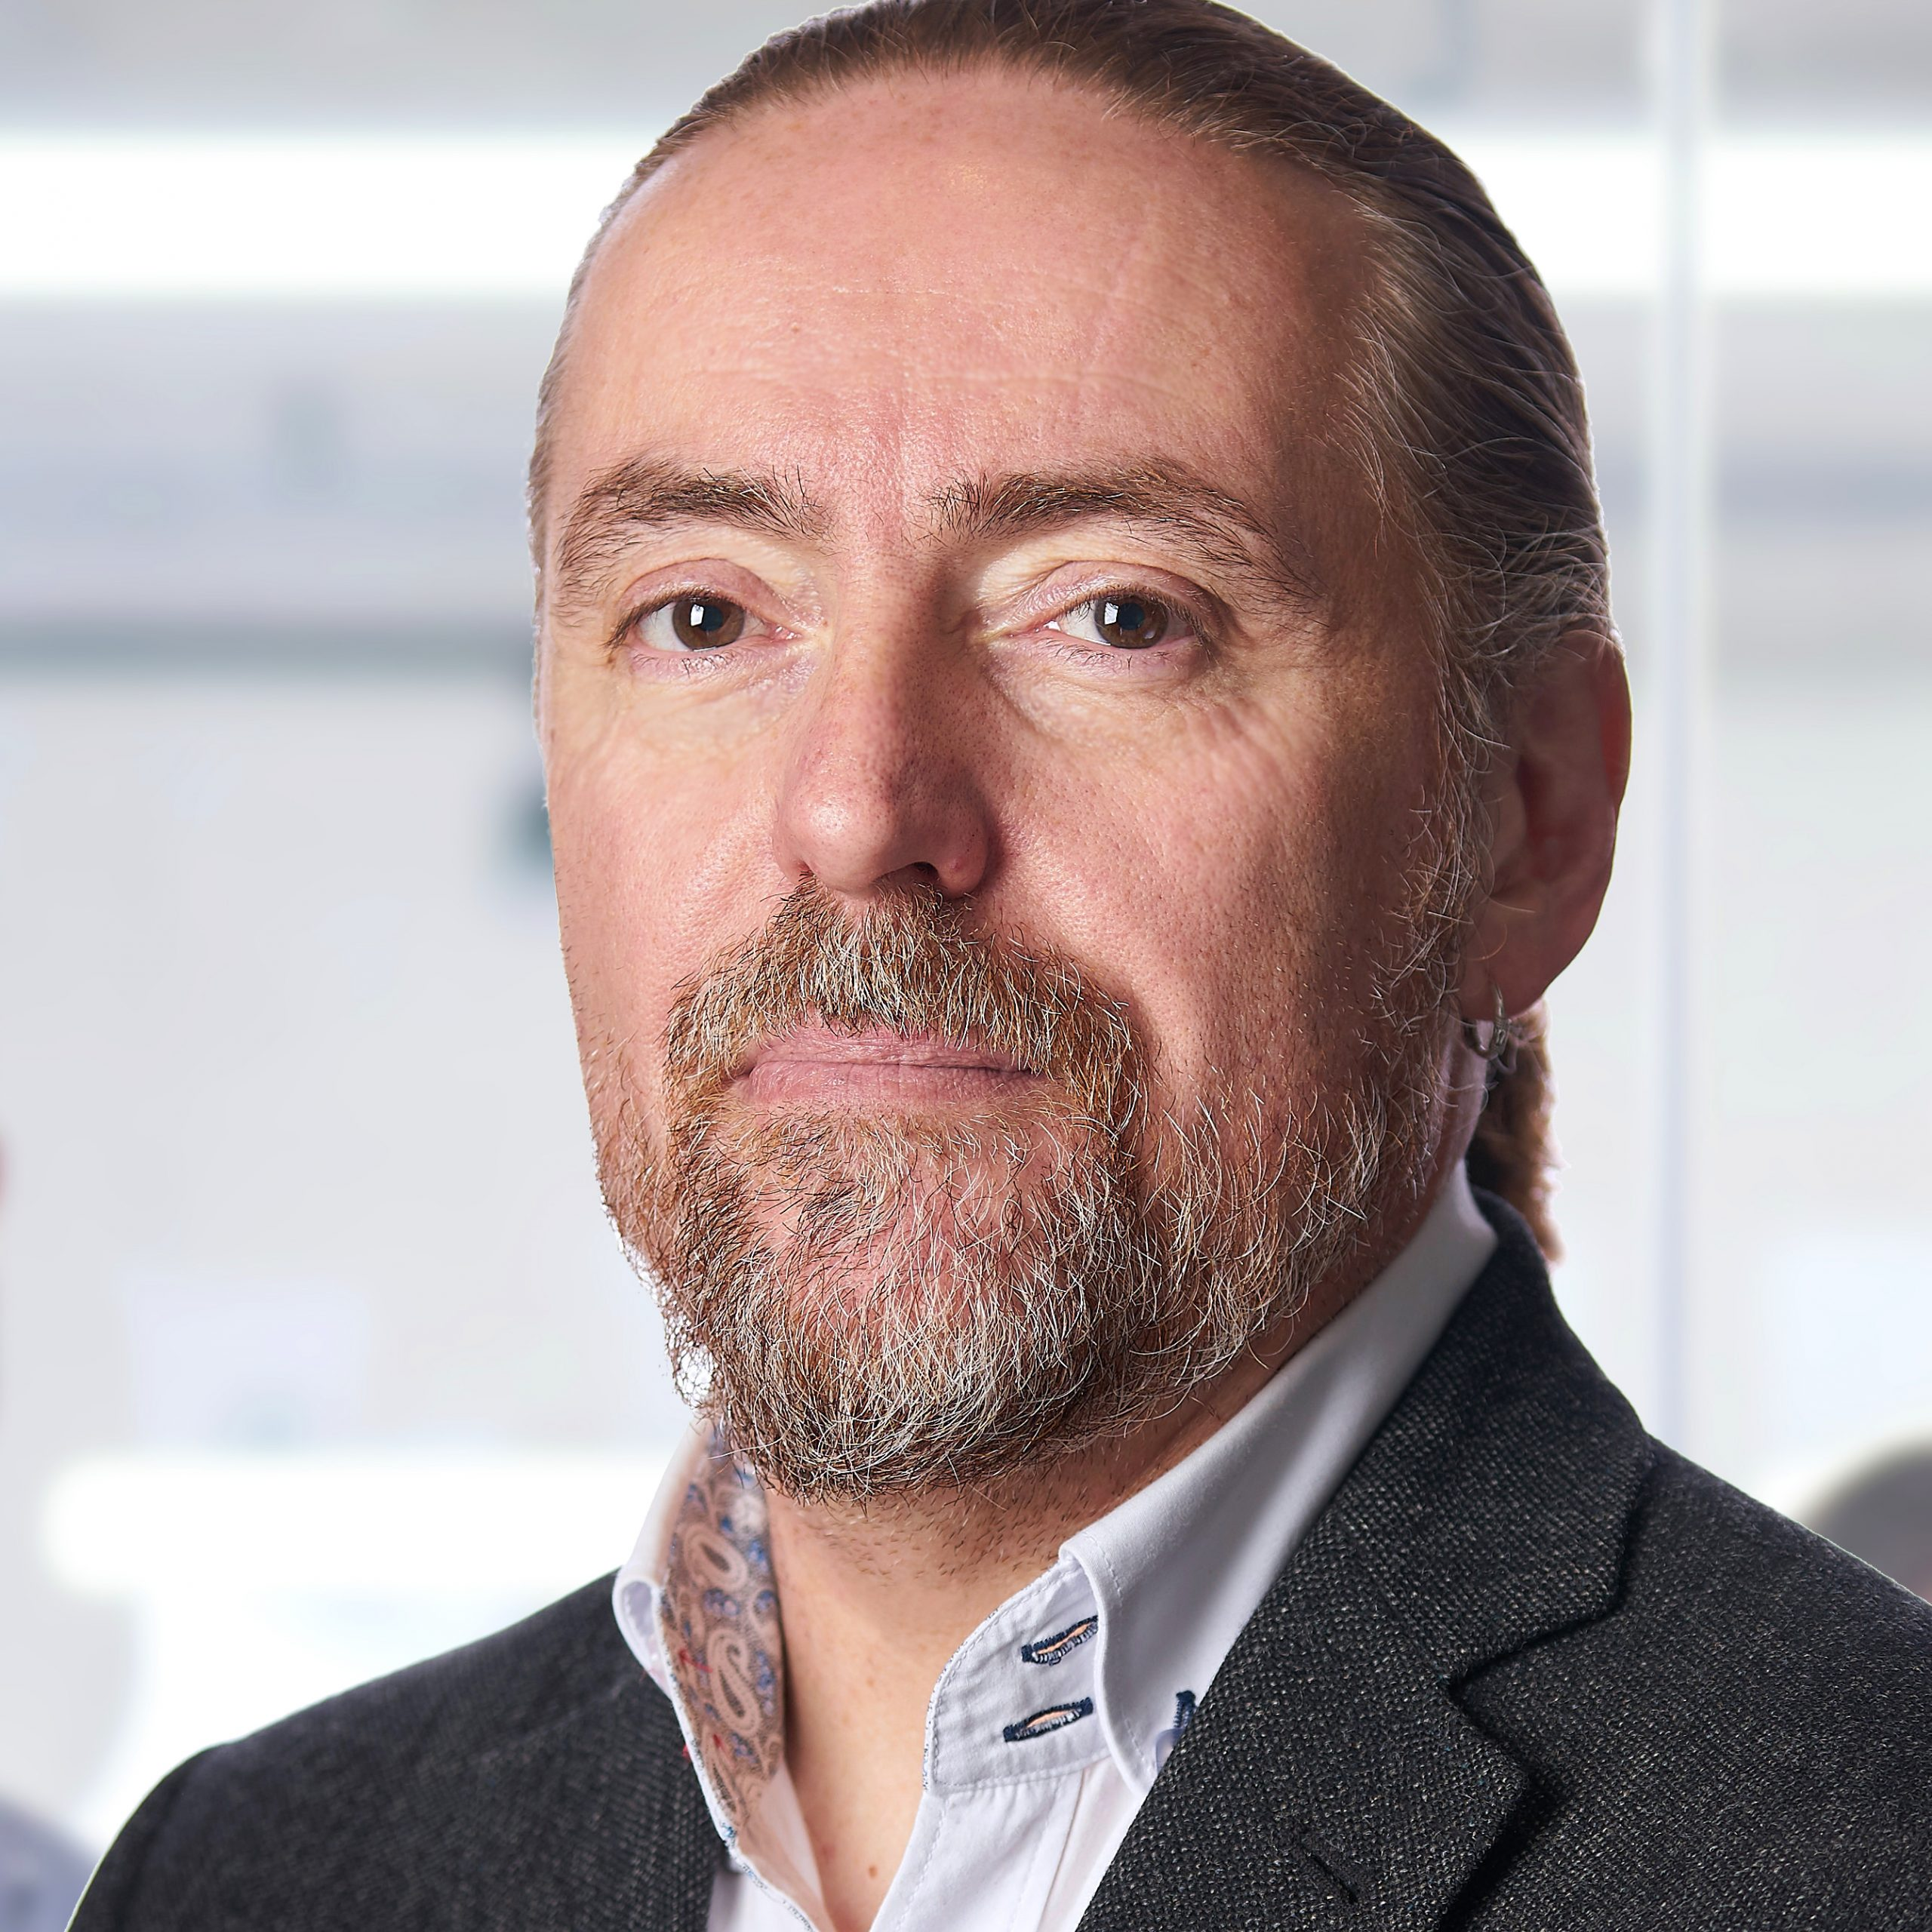 Richard Collins CSR Accreditation